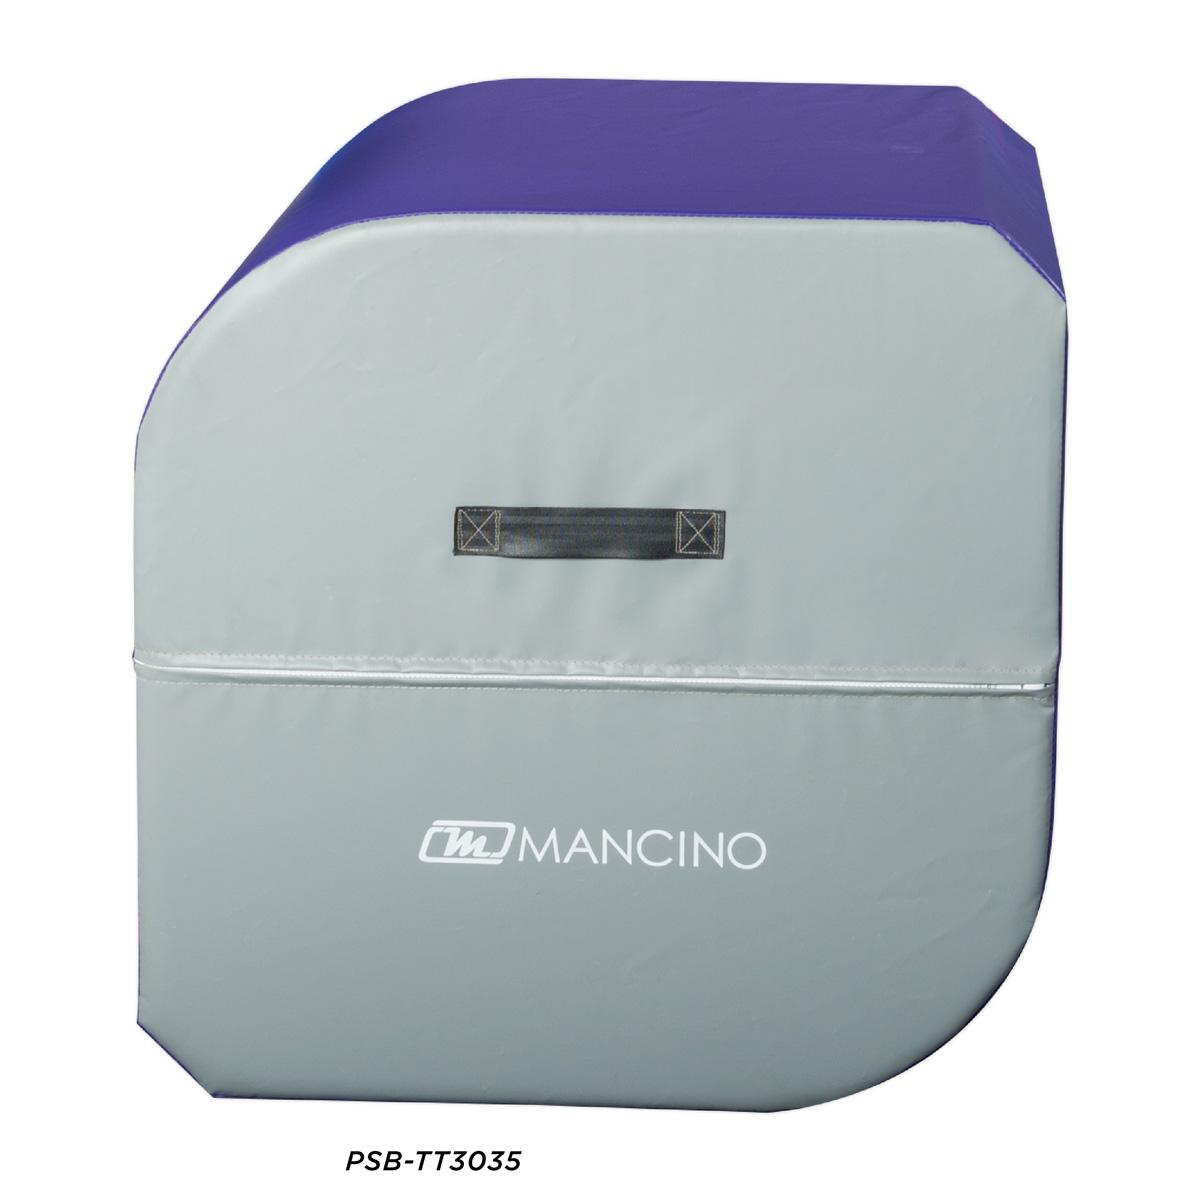 mancino mats tumble trainers 30x35 for teens cheerleaders and gymnasts